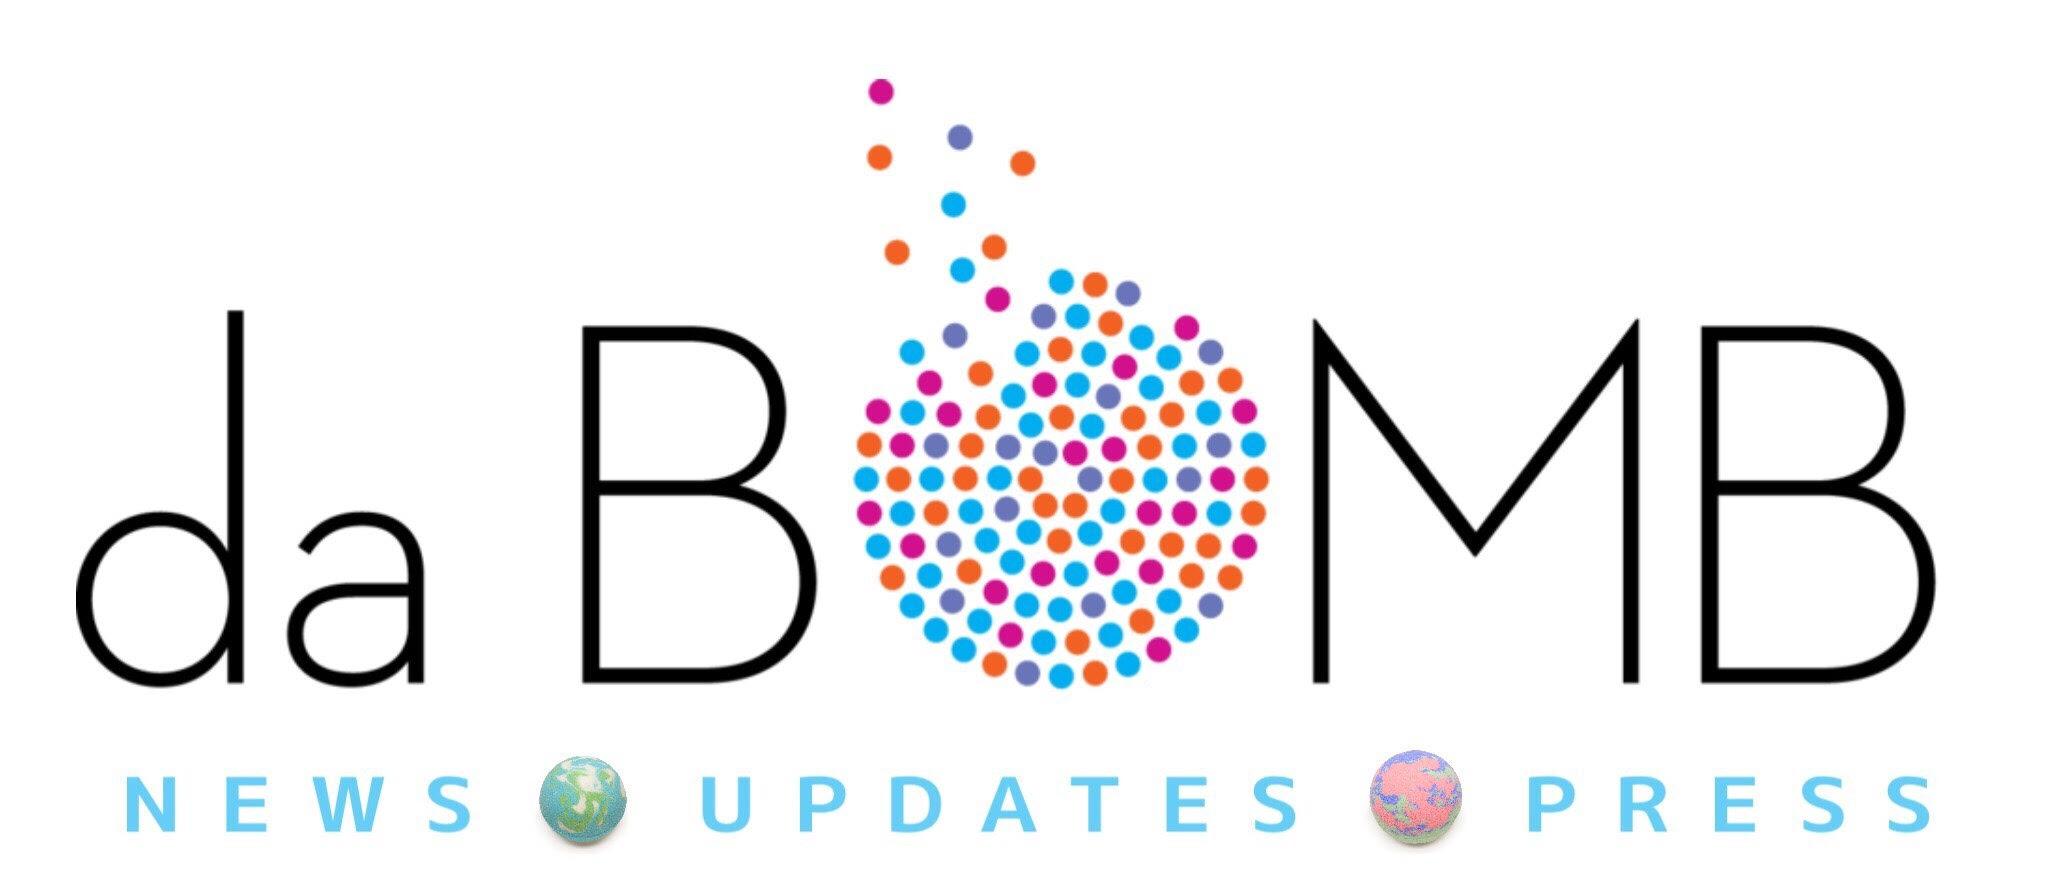 da Bomb News Updates and Press